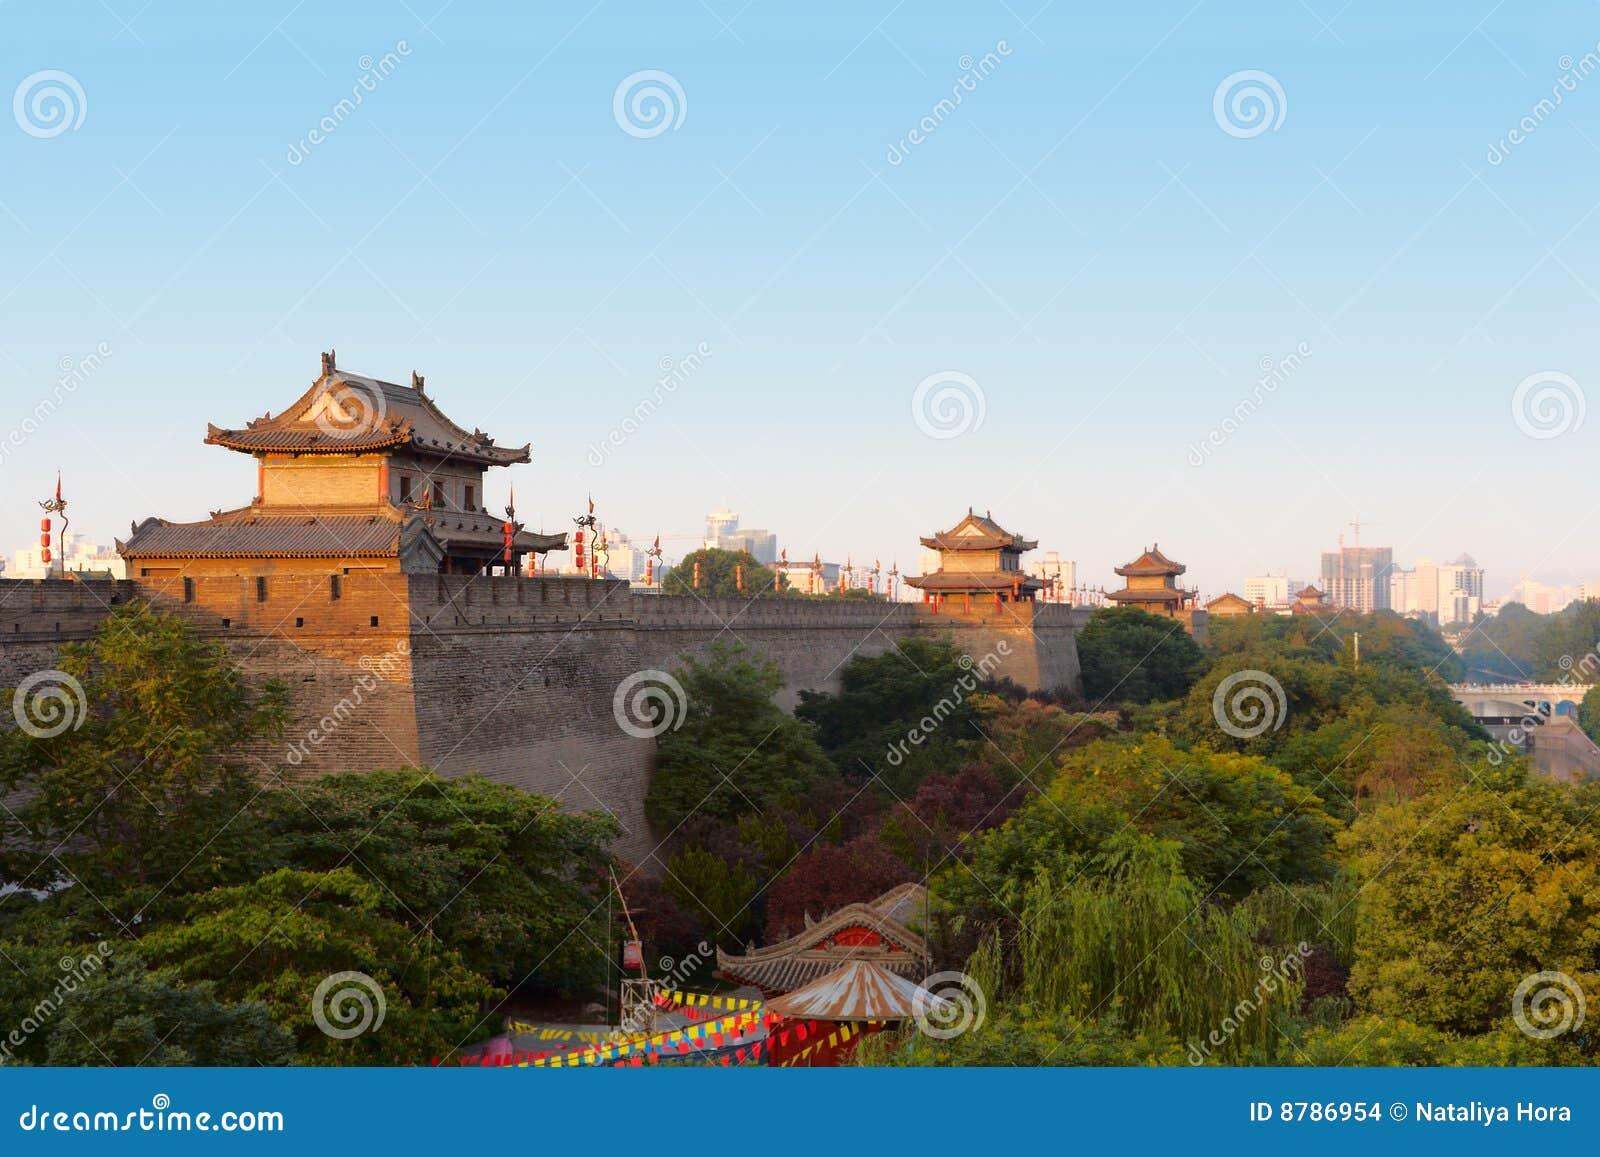 Xi an city wall